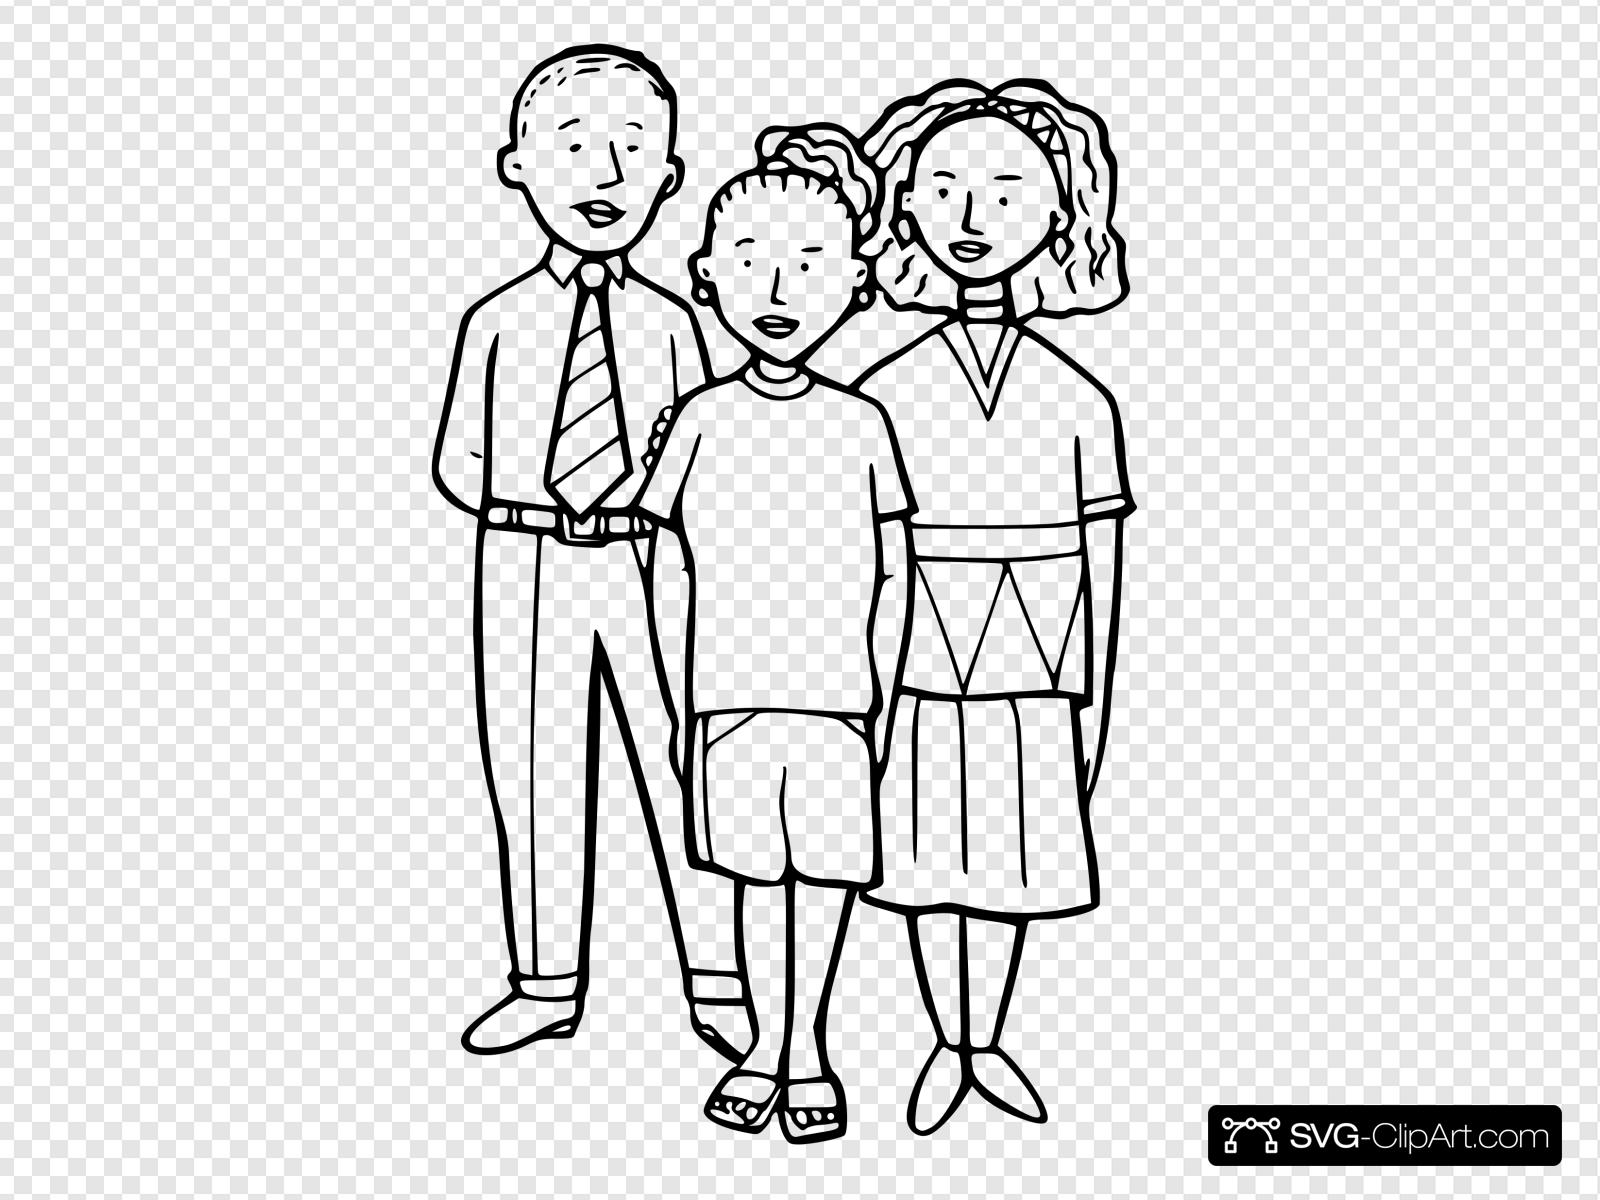 Three Children Outline Clip art, Icon and SVG.